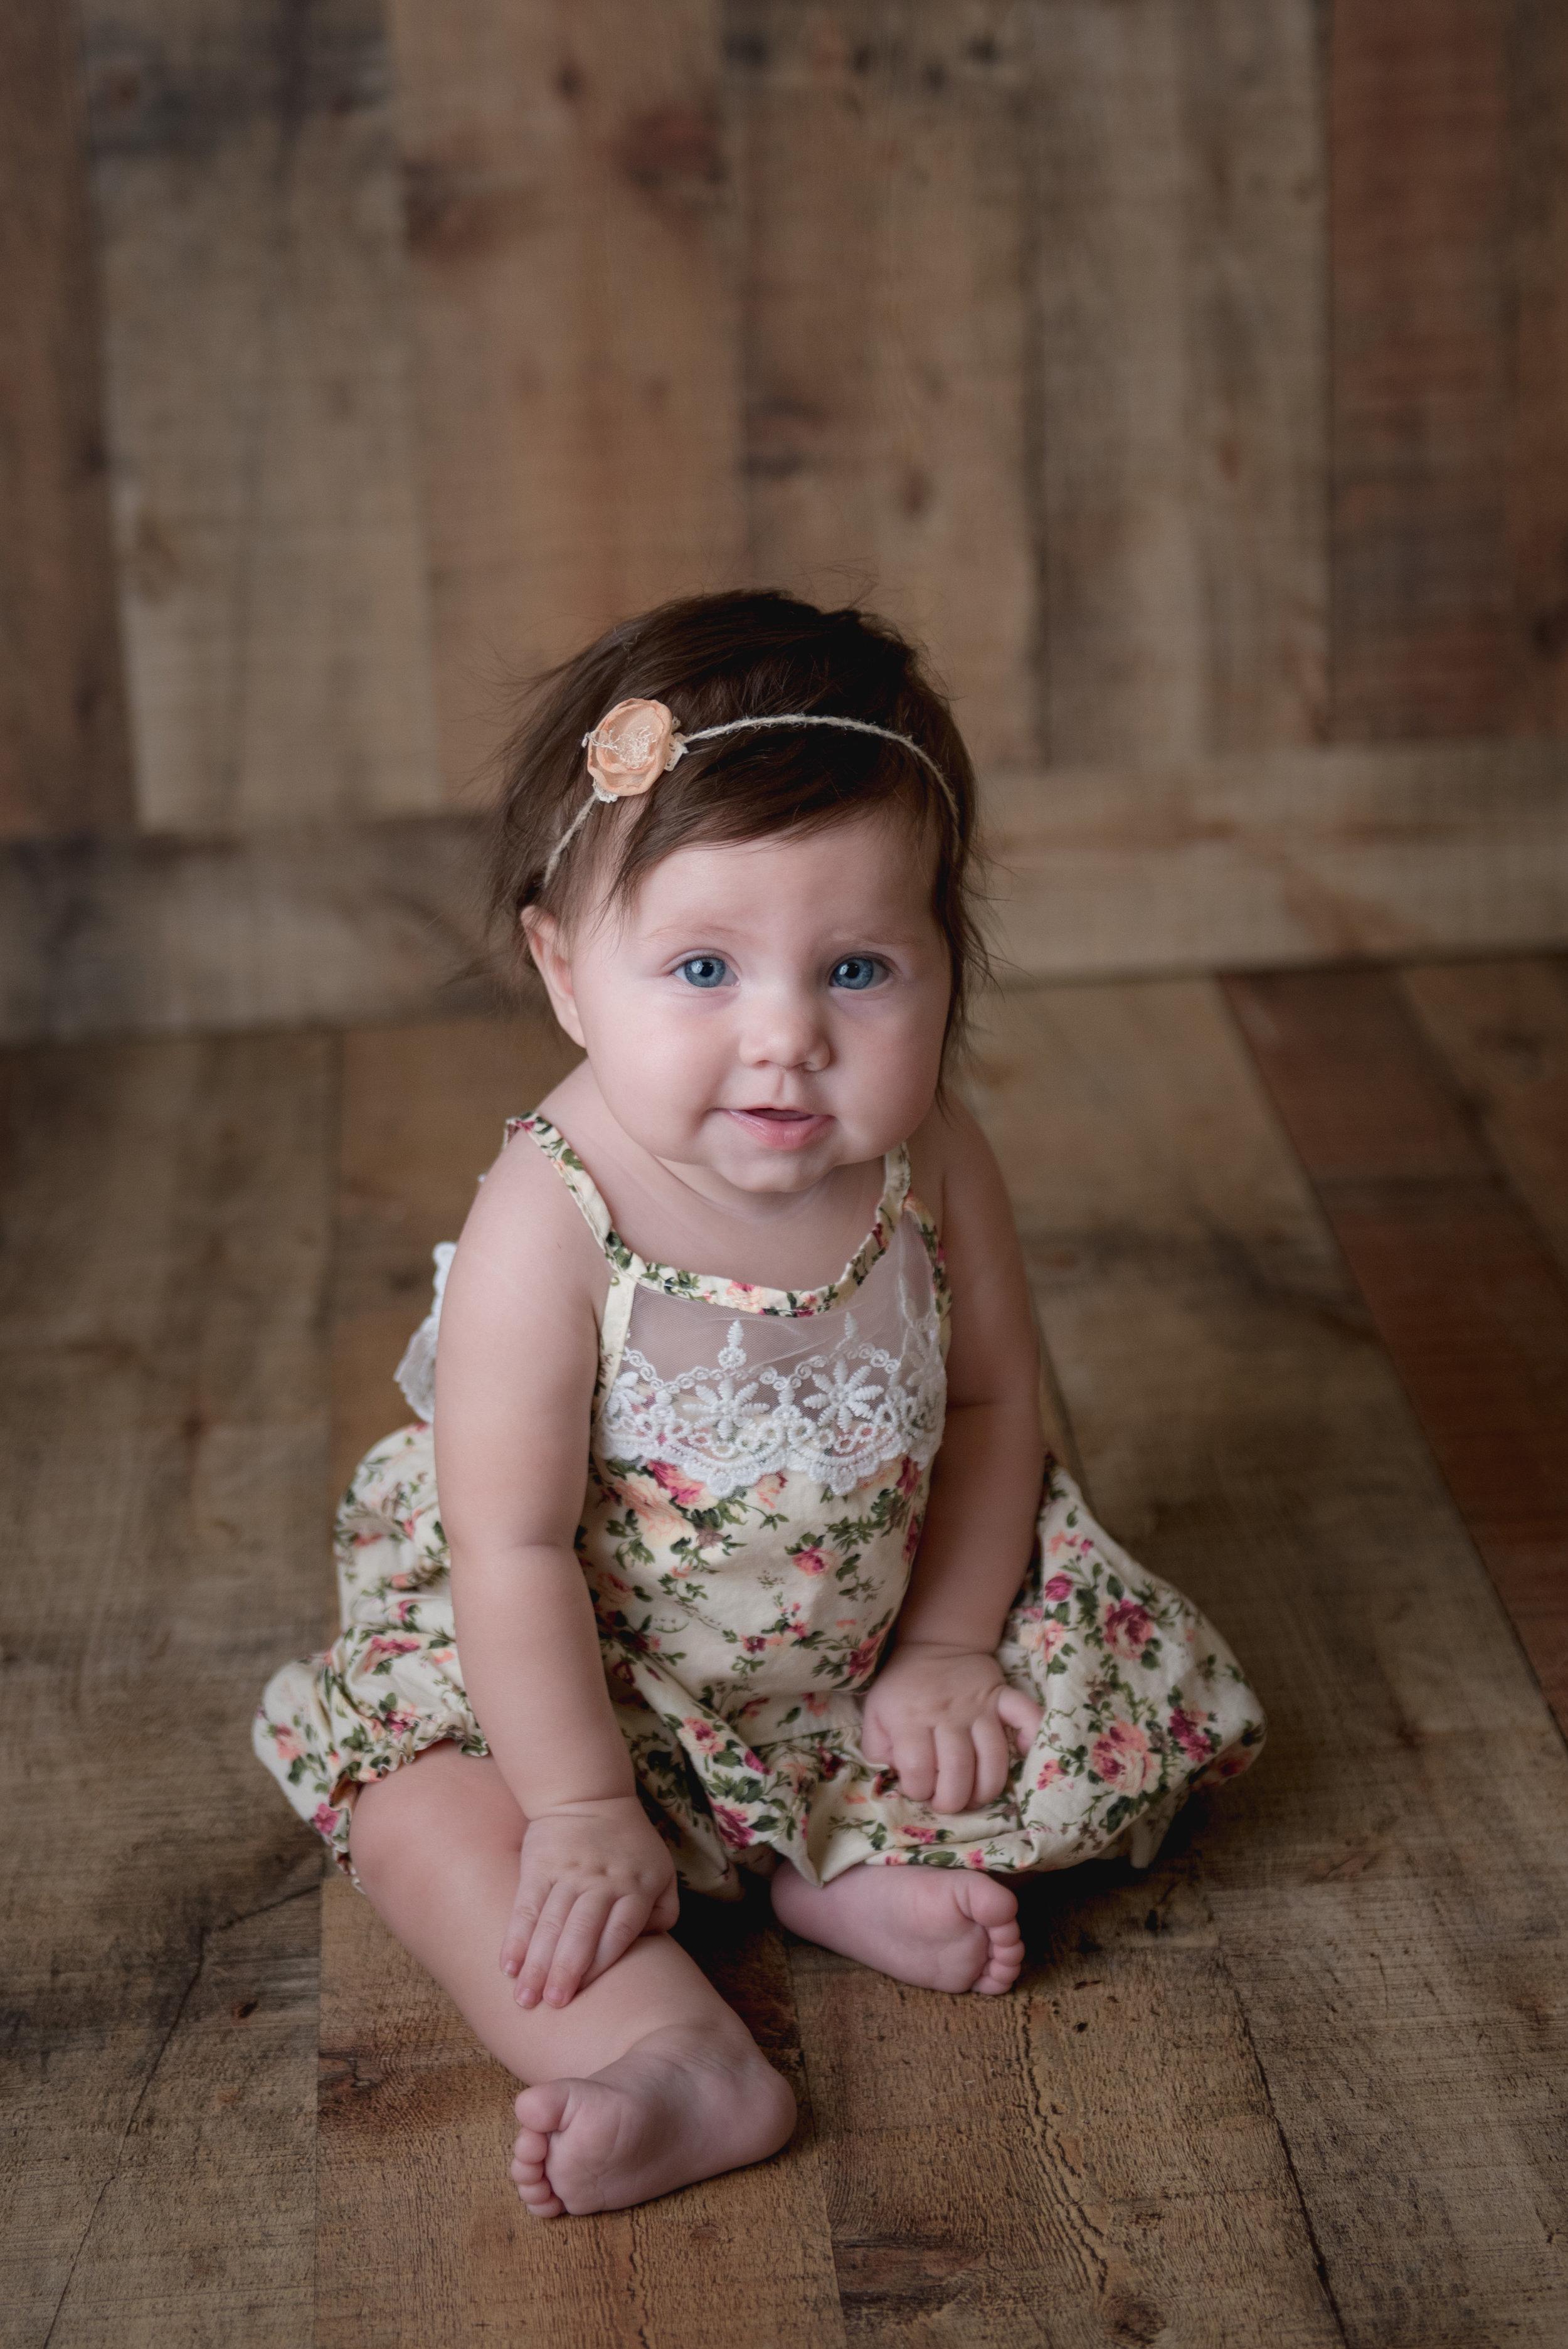 Sitting Milestone CT Baby Photographer | www.heatherandsarahphoto.com